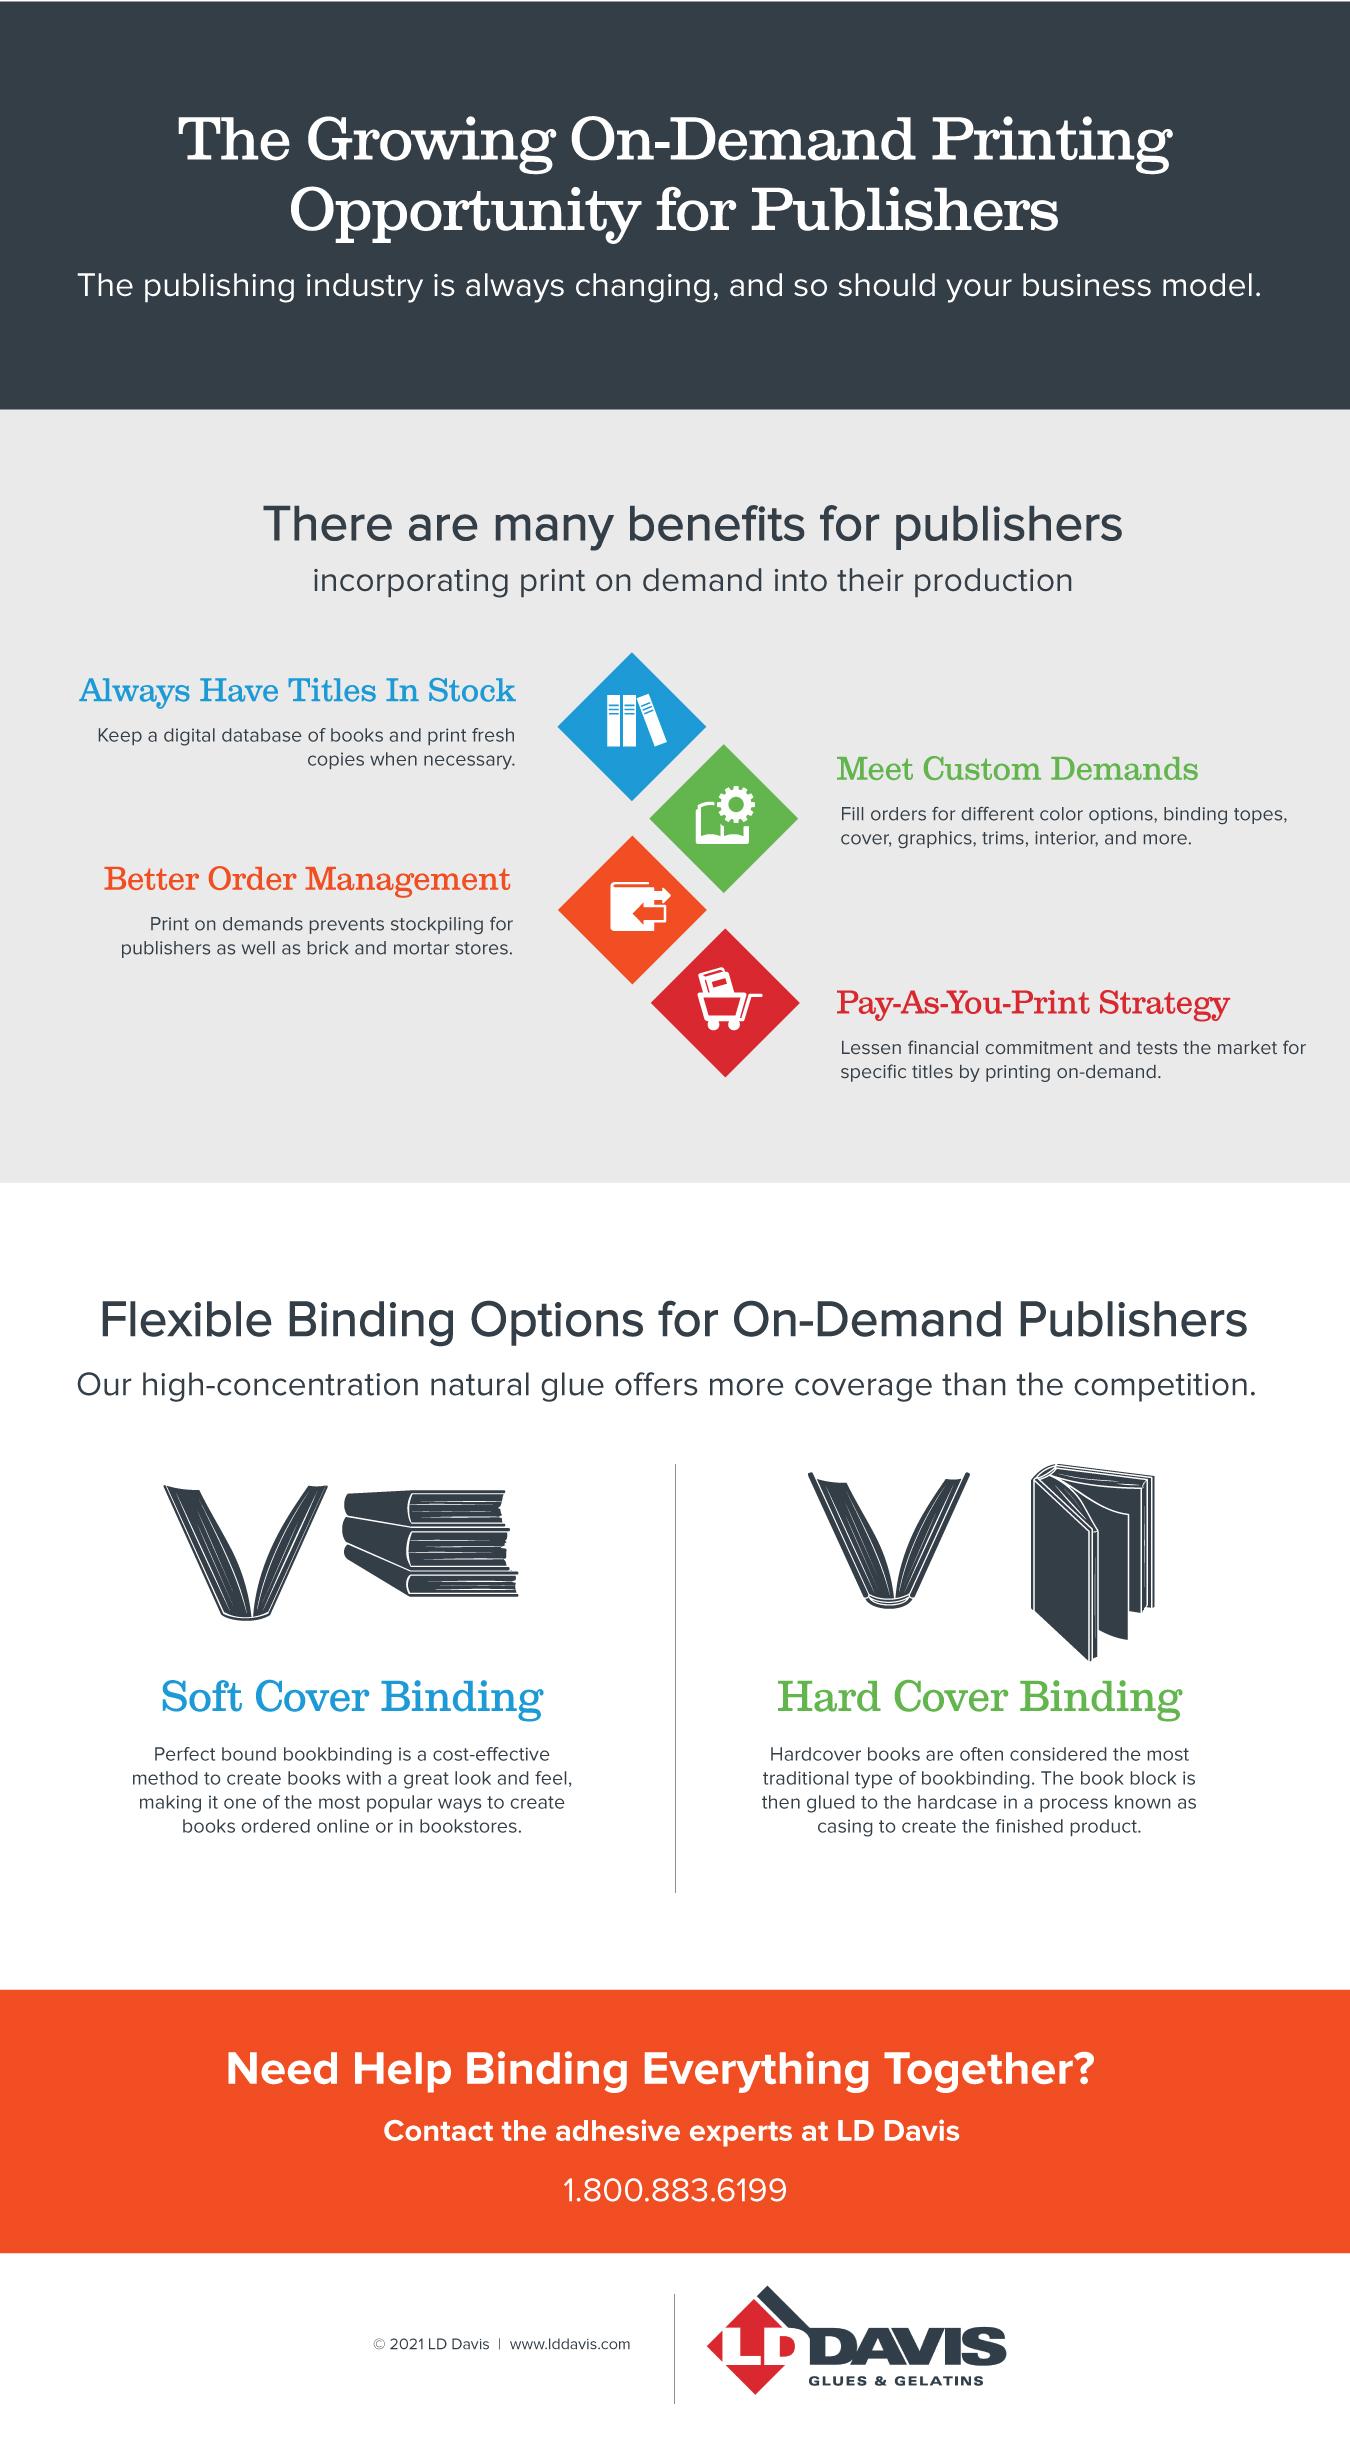 ldd-on-demand-printing-infographic-v1